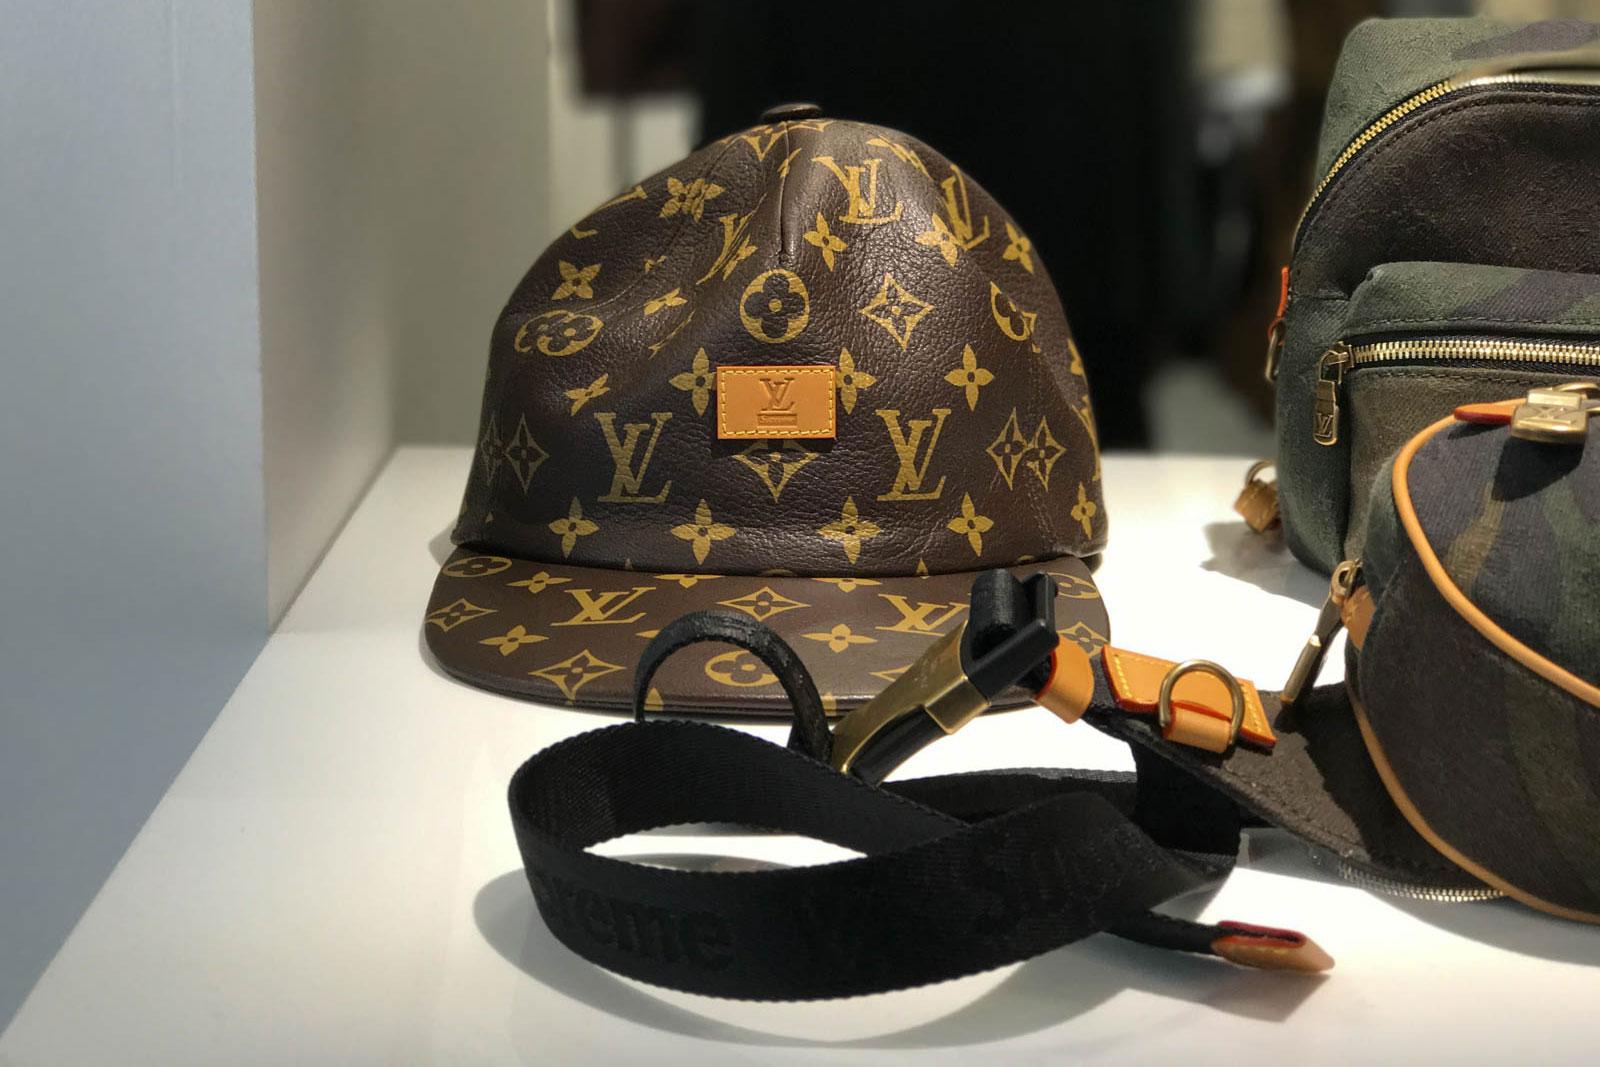 Supreme x Louis Vuitton 2017 Fall/Winter Closer Look Showroom - 3703533